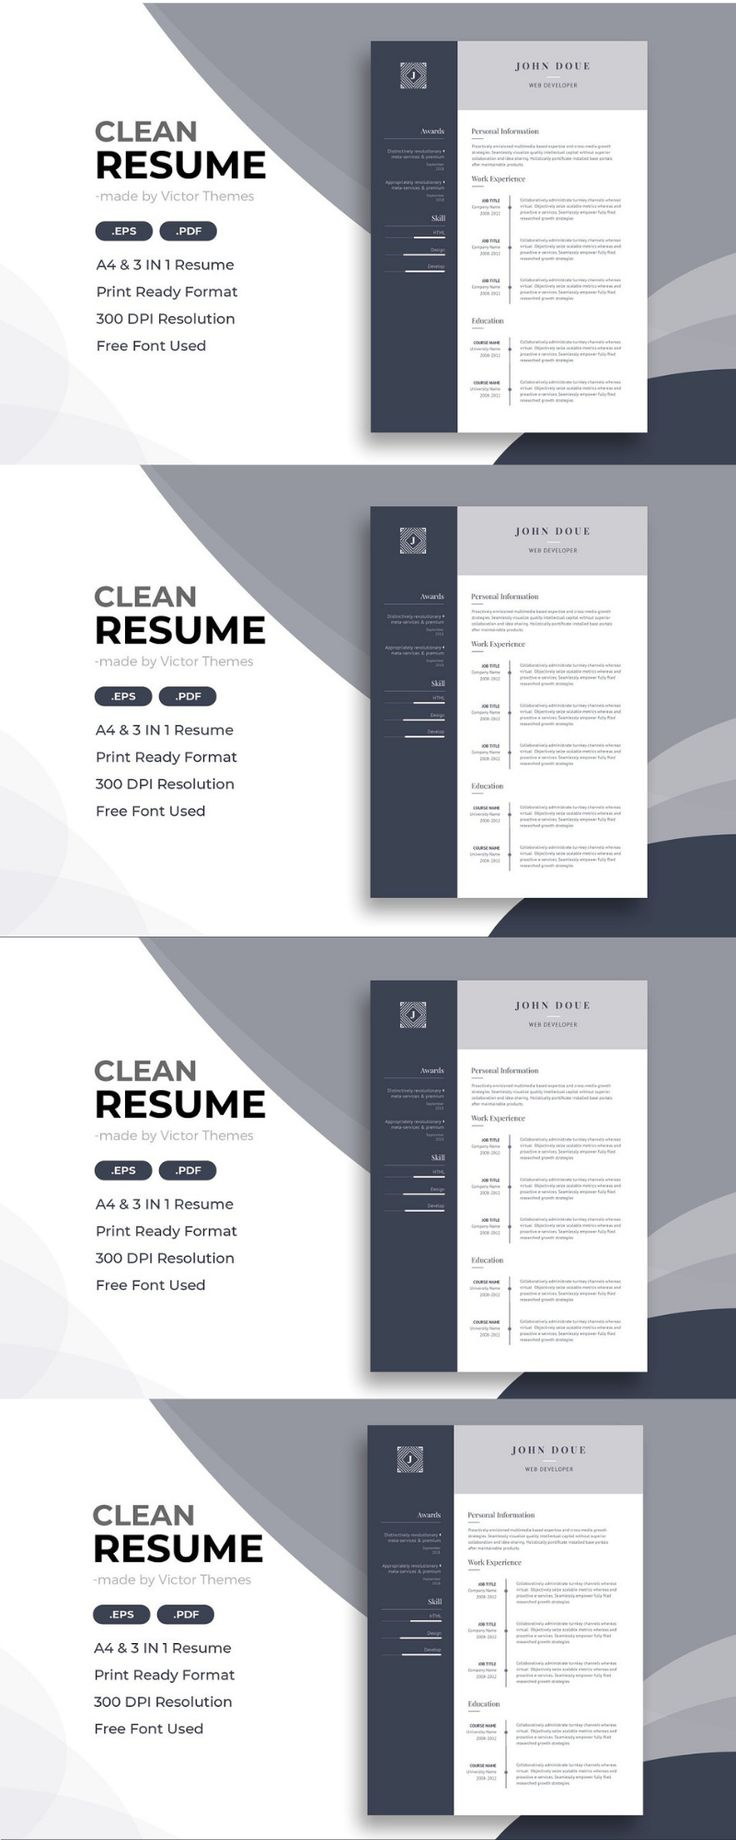 Web developer cv template cv template web developer cv